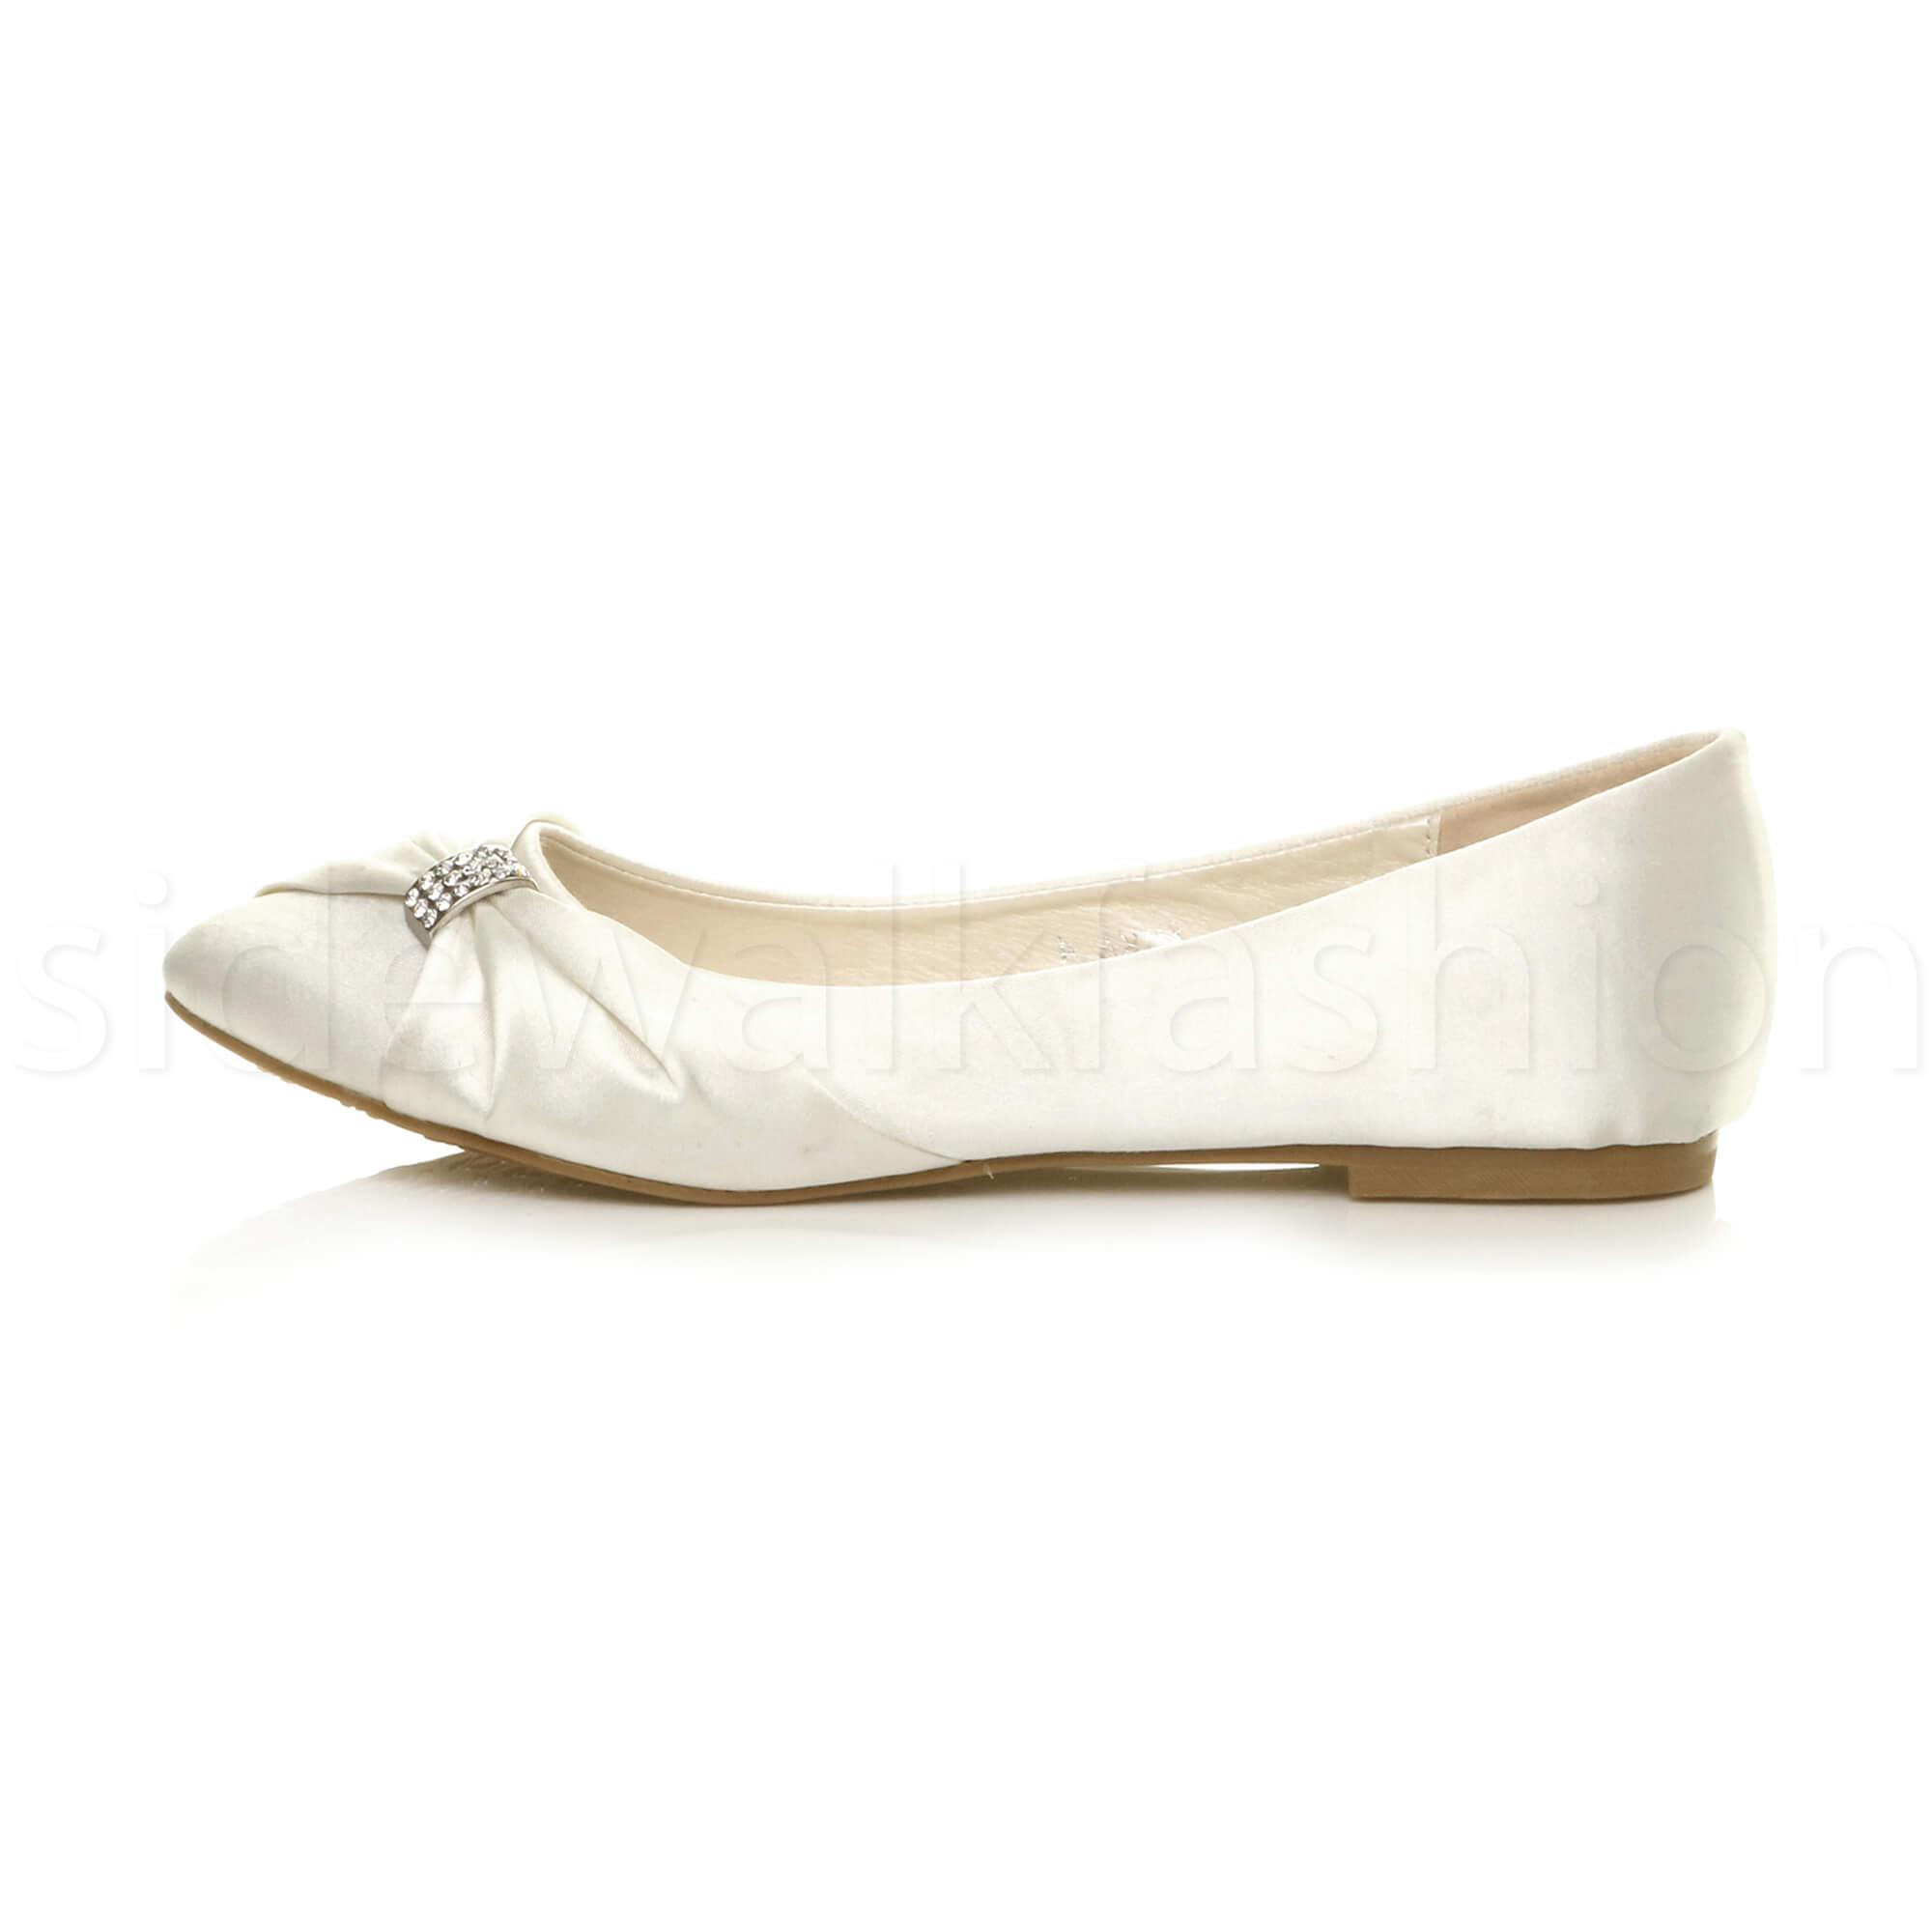 Womens-ladies-flat-wedding-bridesmaid-ruched-diamante-bridal-shoes-pumps-size thumbnail 11